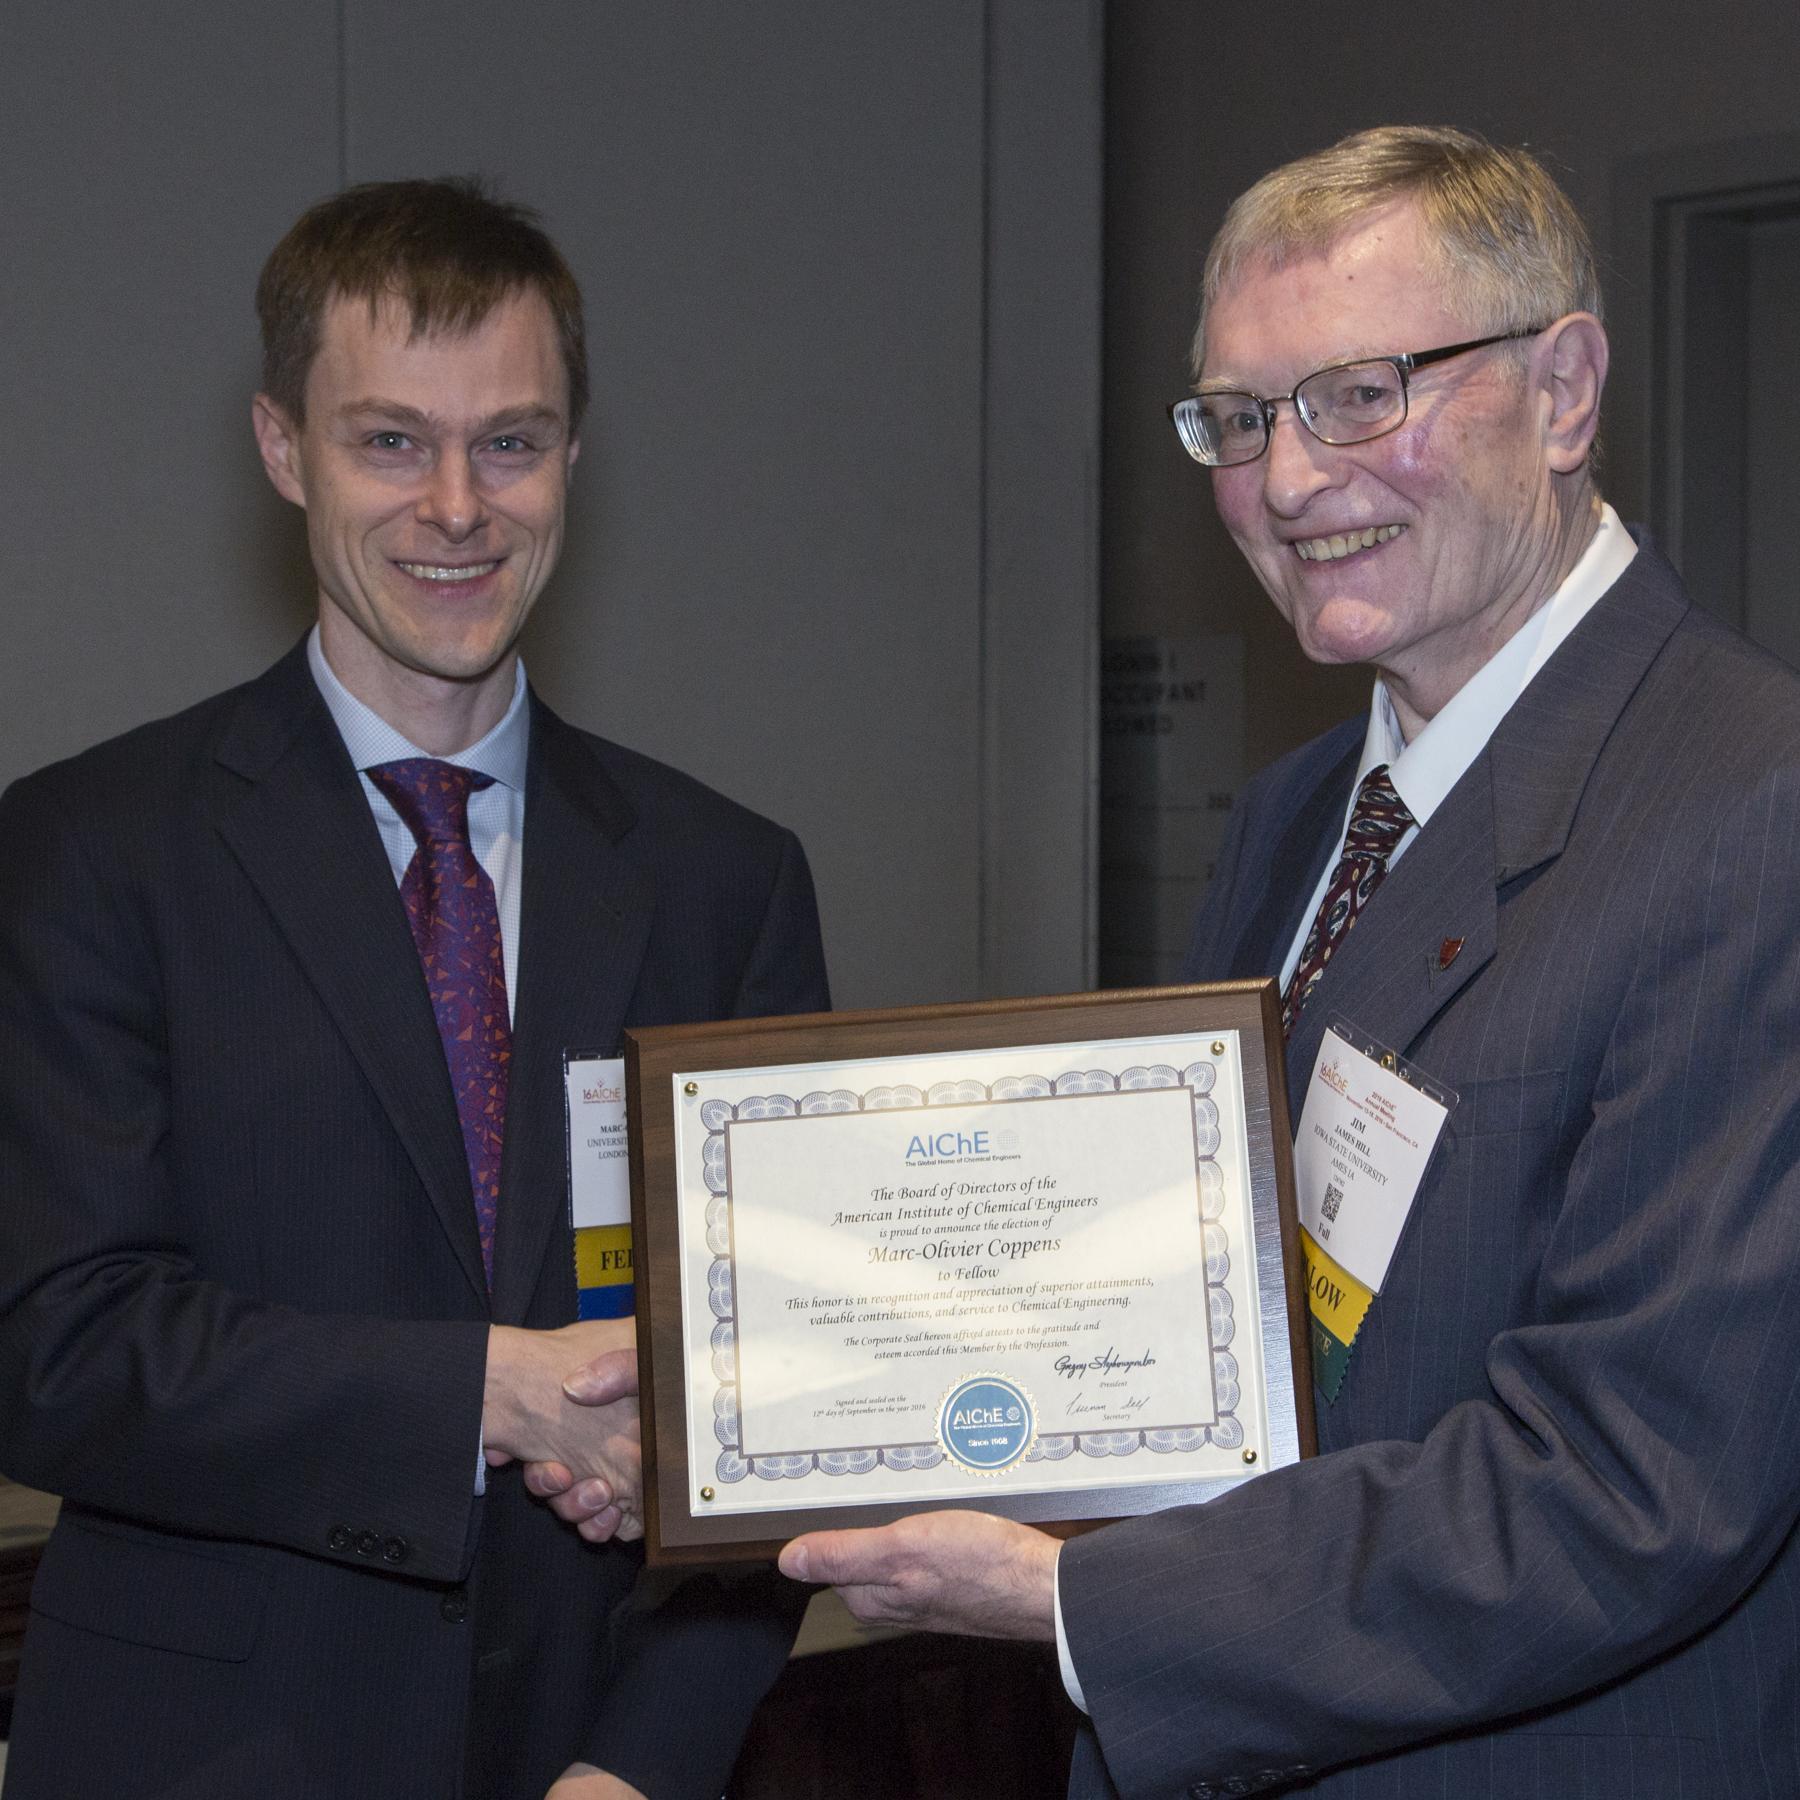 Professor Marc-Olivier Coppens (left) awarded AIChE Fellow plaque, San Francisco Photo credit: Margot Hartford